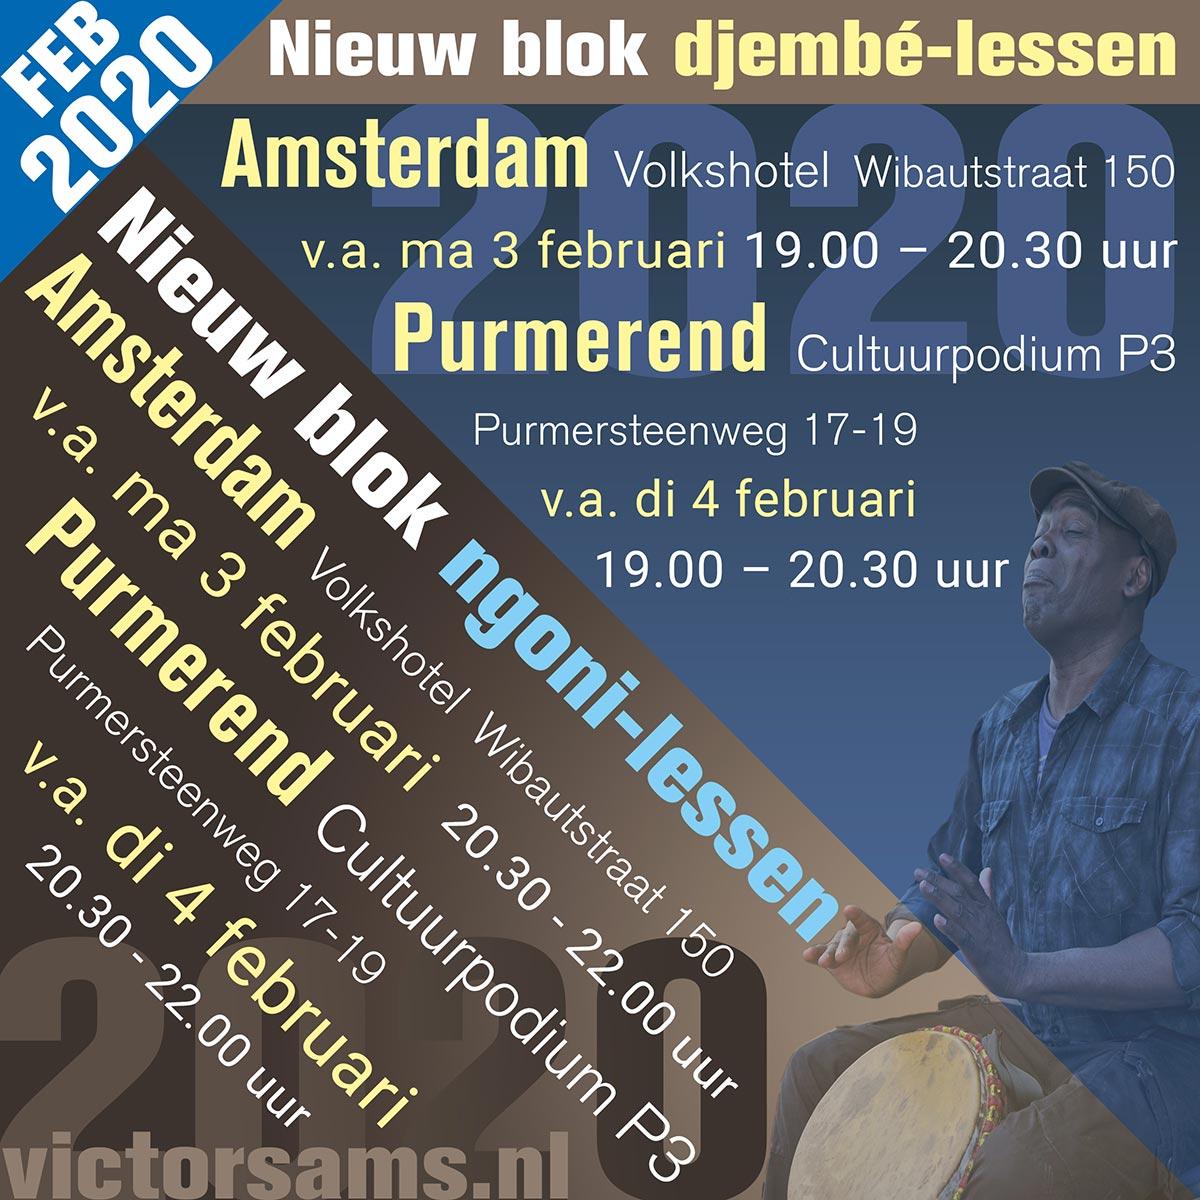 wekelijkse djembe lessen victor sams februari 2020 - Victor Sams Djembé Workshops